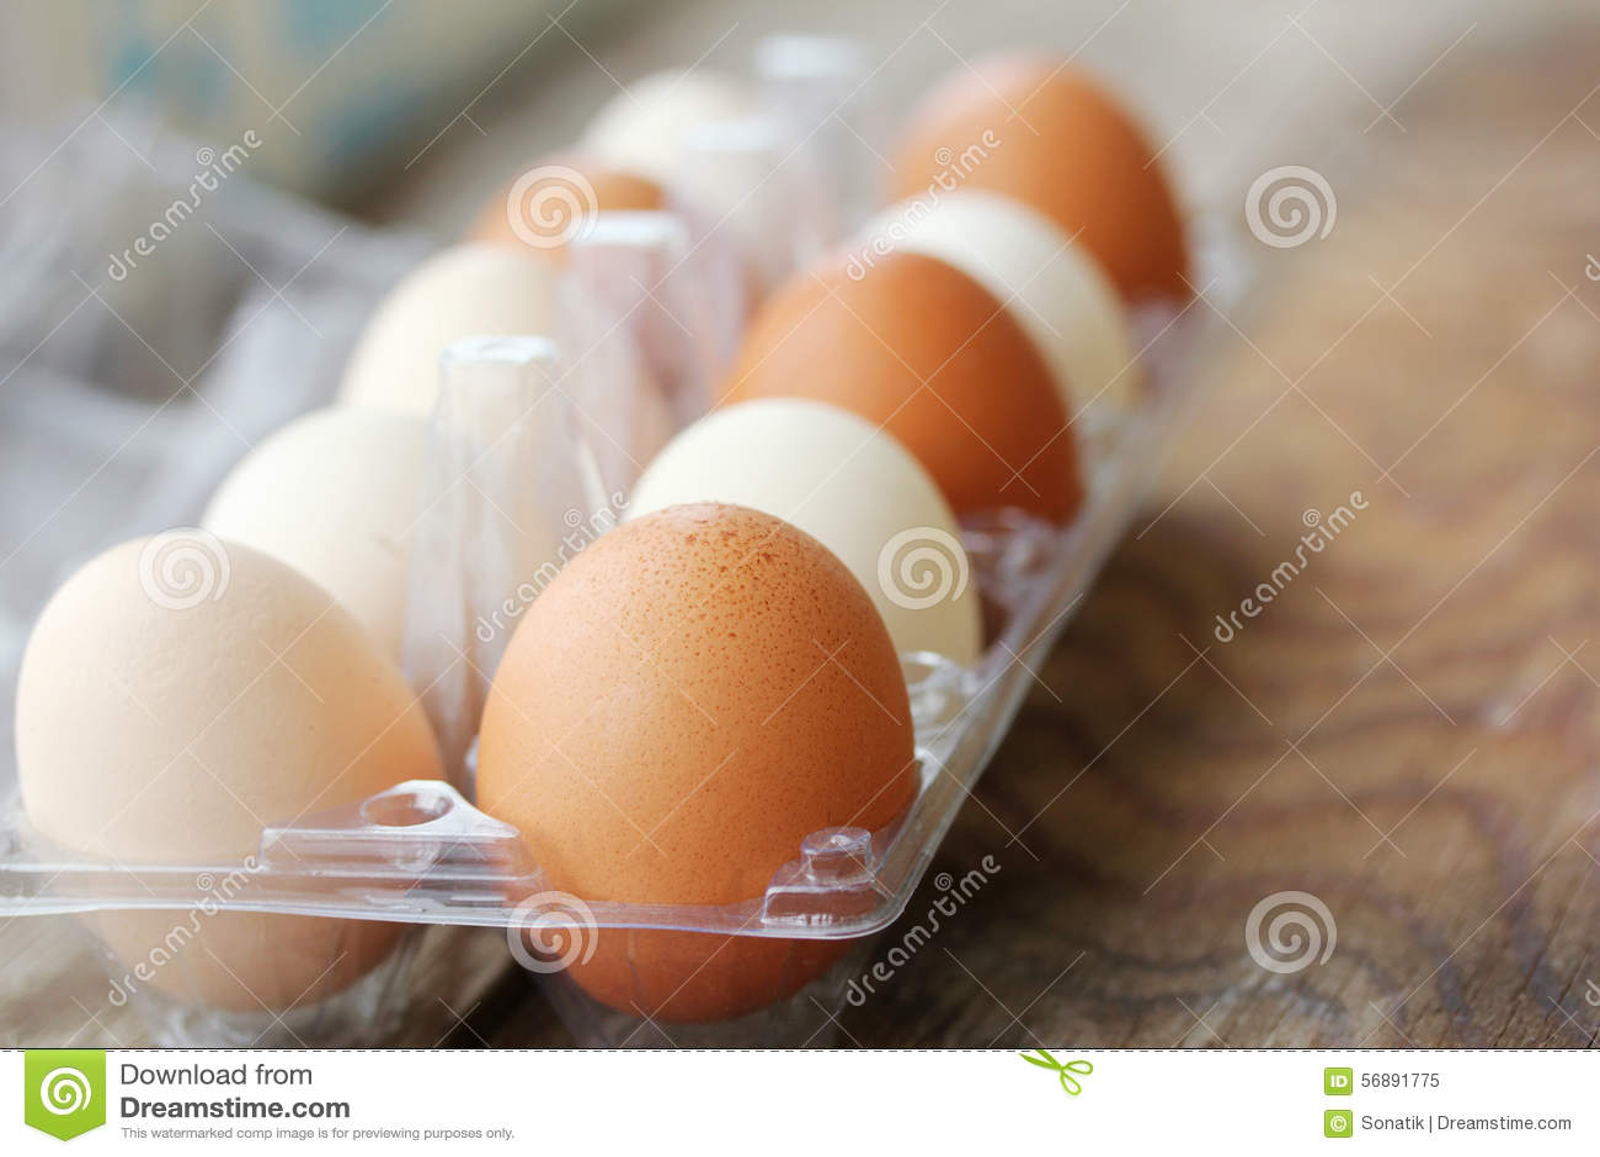 Ovos na embalagem